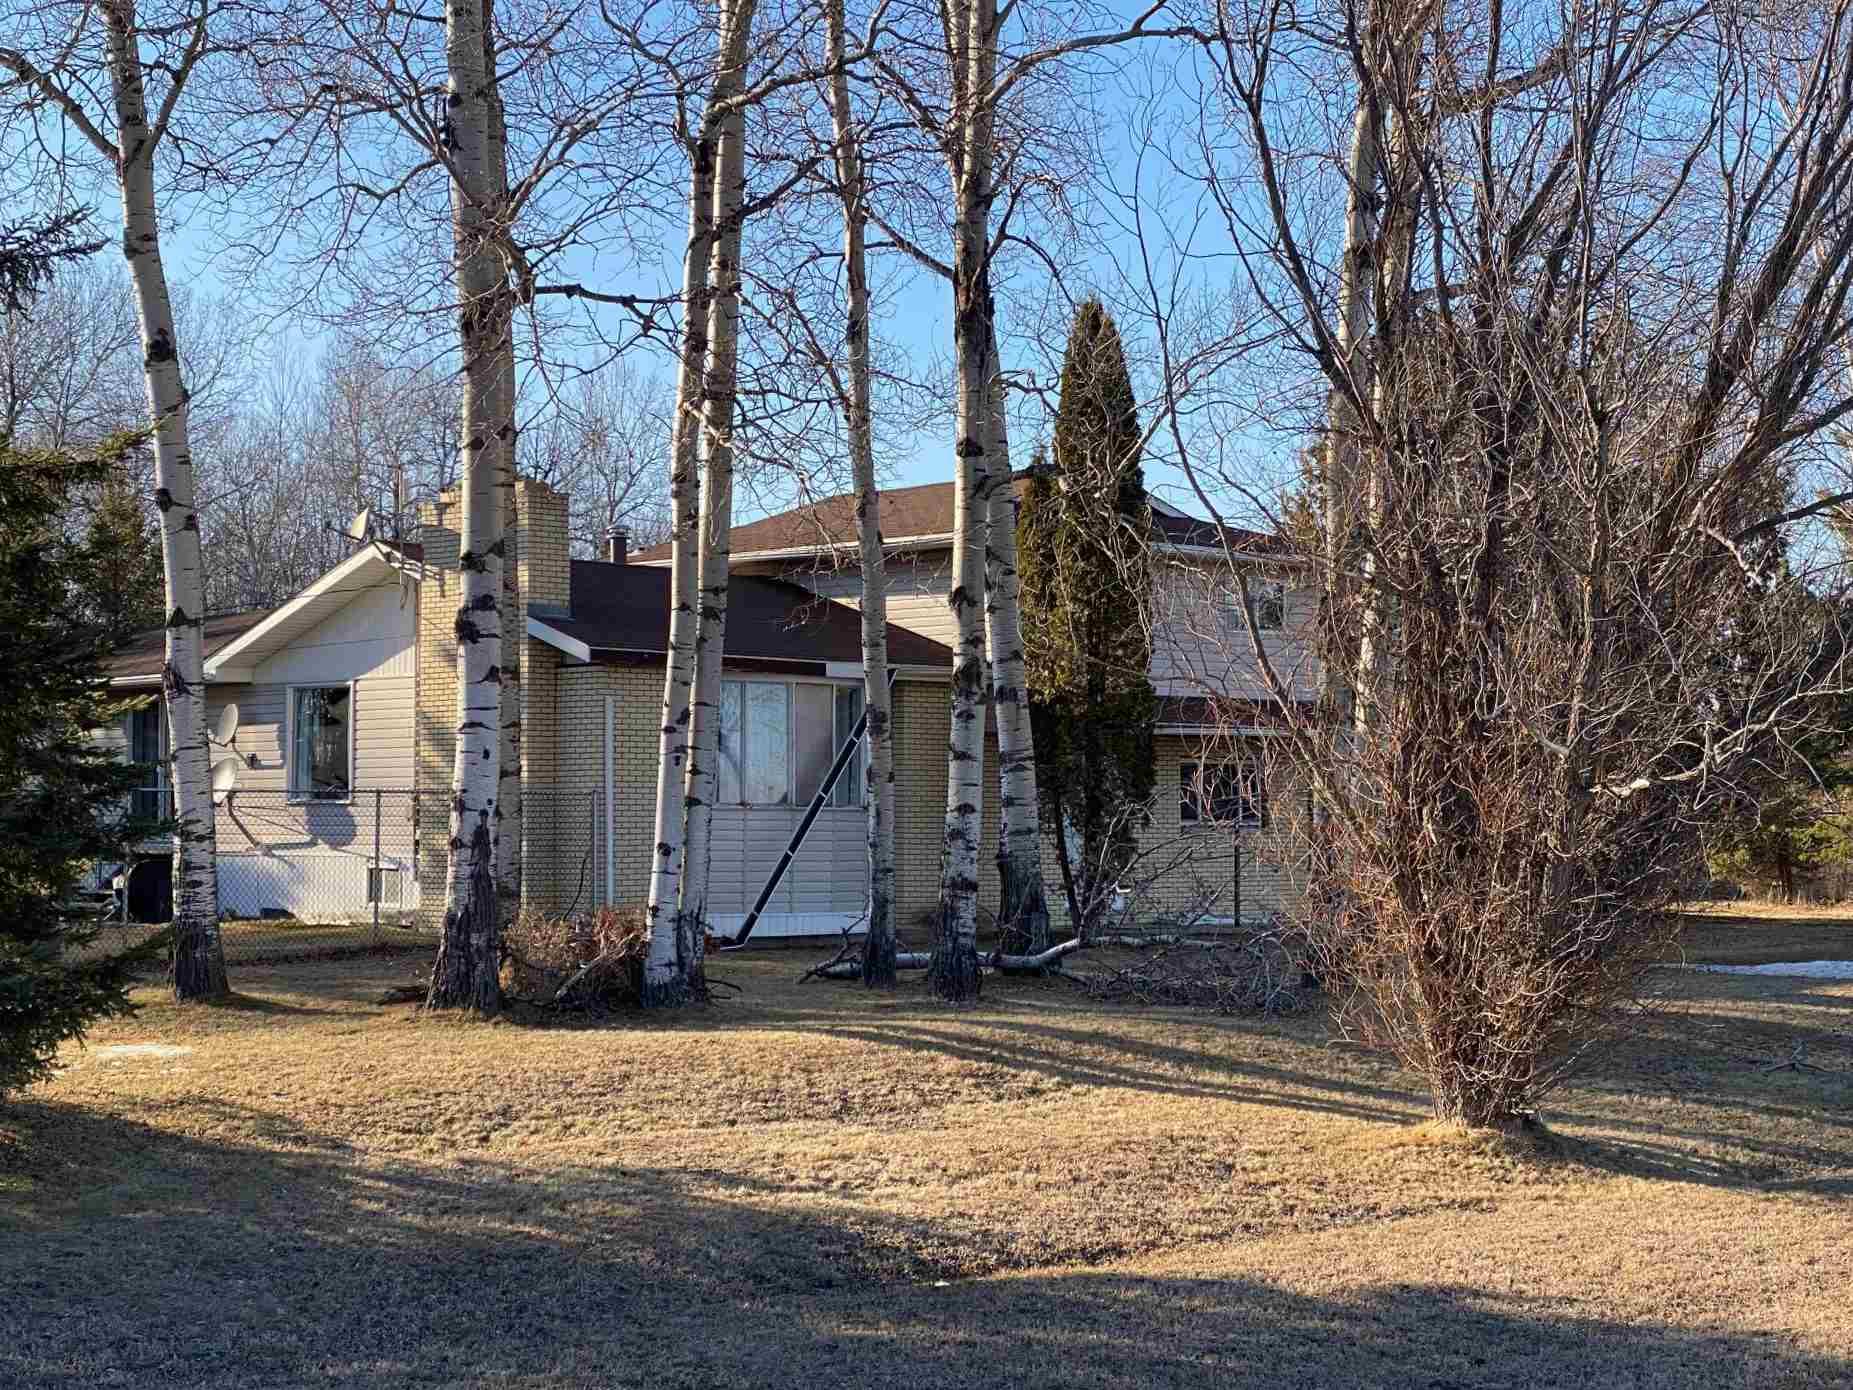 5921 Hwy 621, Sleeman / Bergland Ontario, Canada